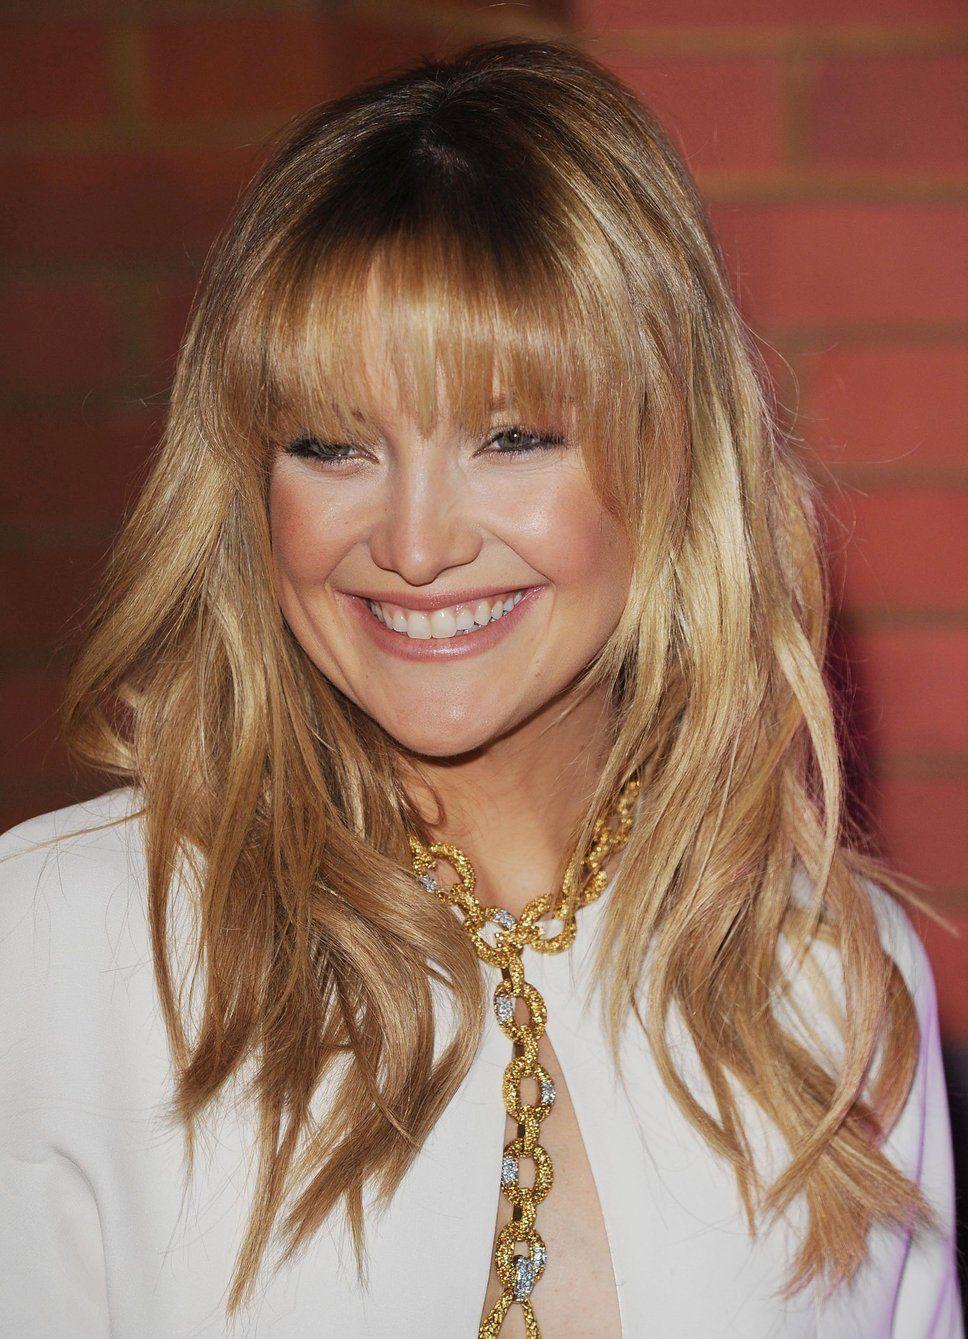 kate hudson fringe wavy blonde hair gold necklace white top